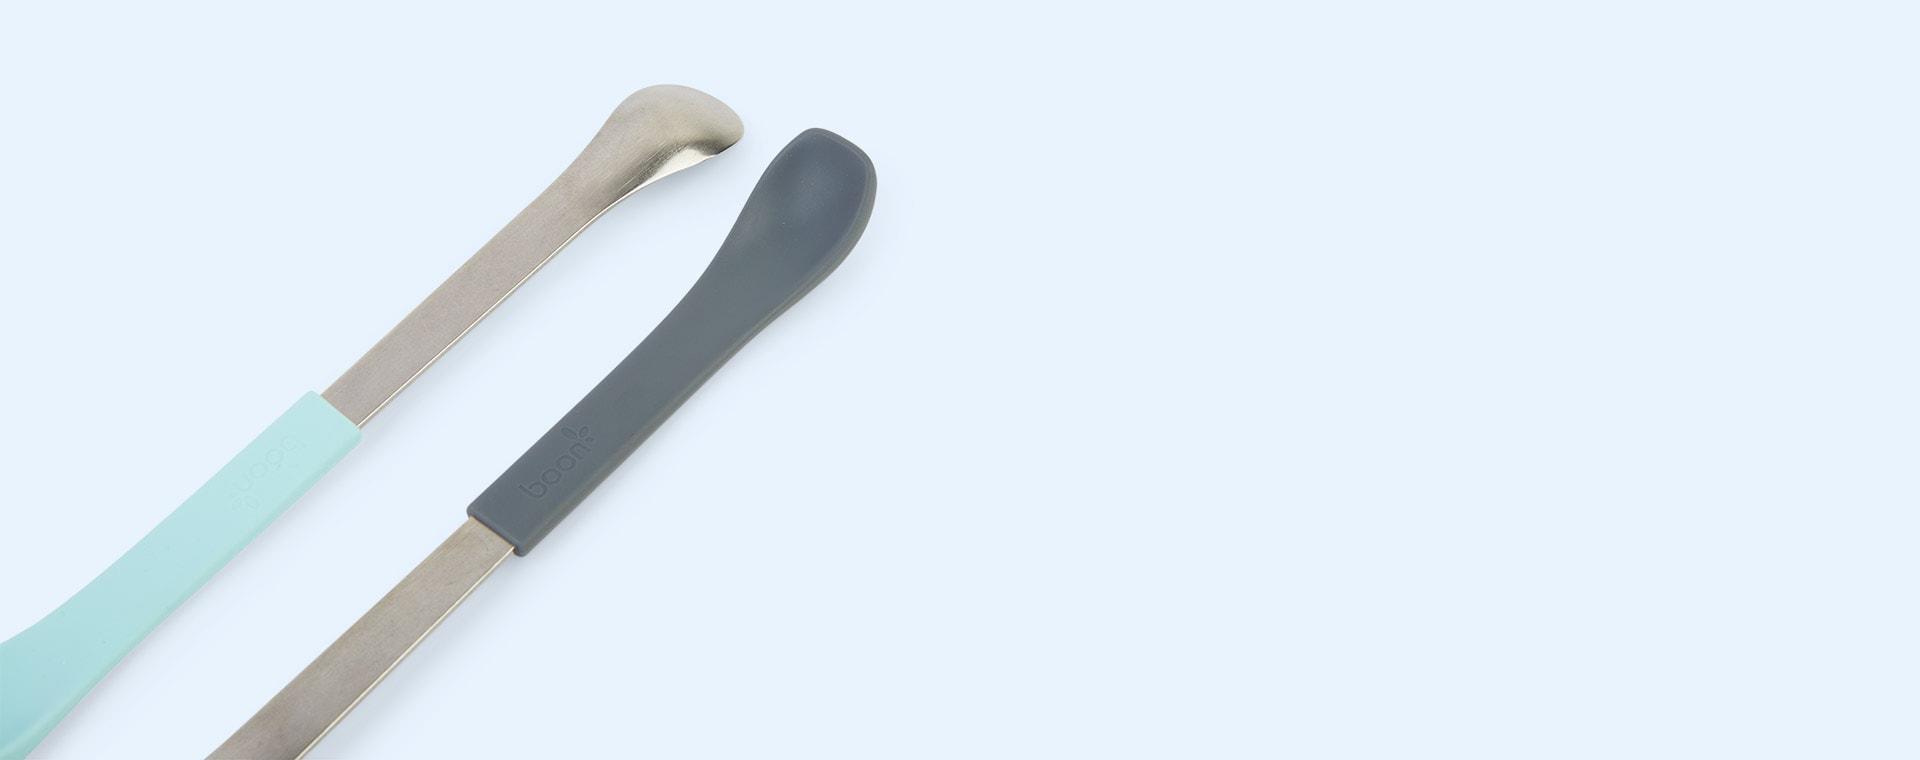 Mint Boon SWAP Spoons